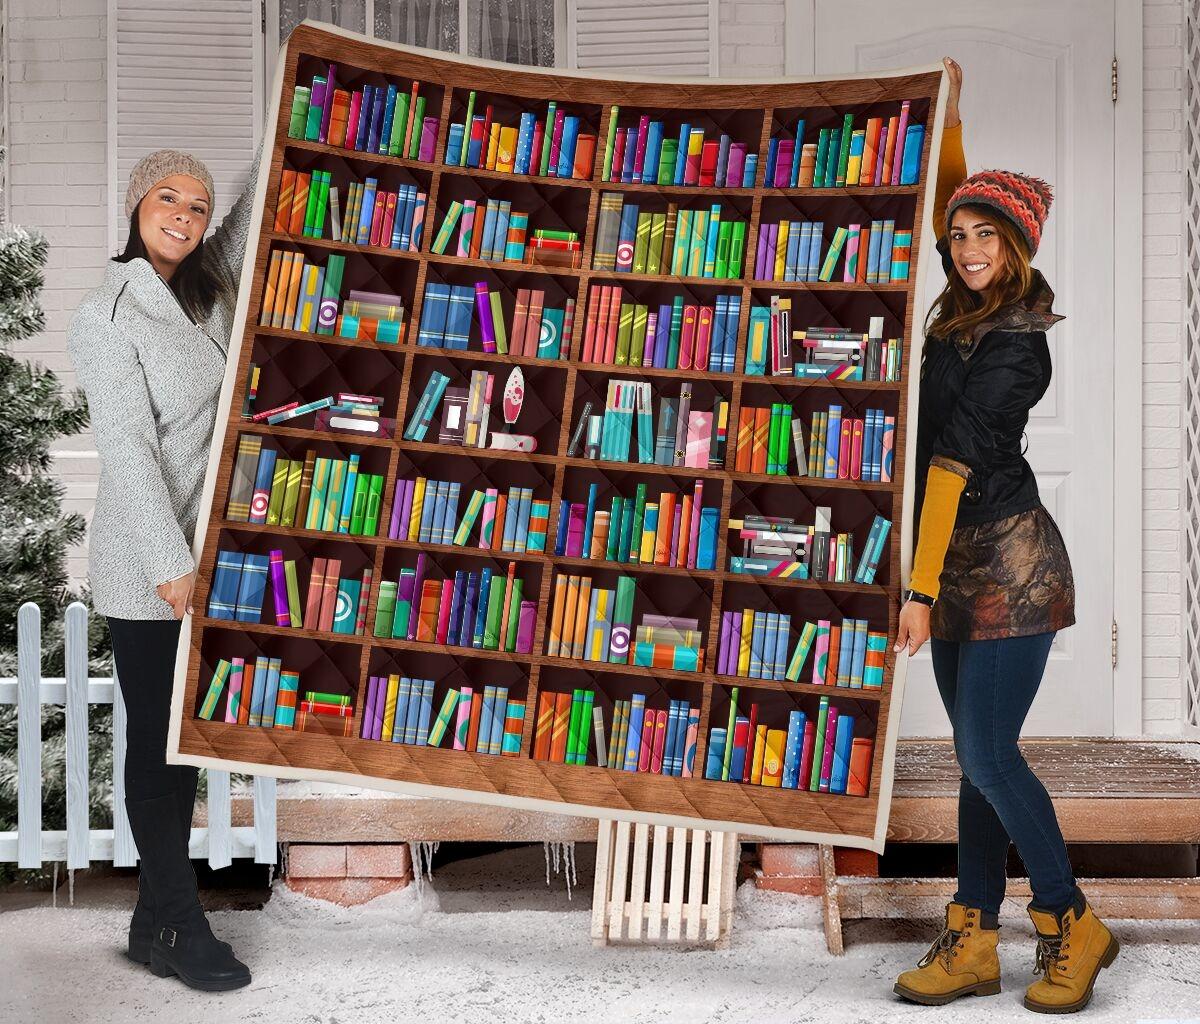 Bookshelf classic quilt blanket 1